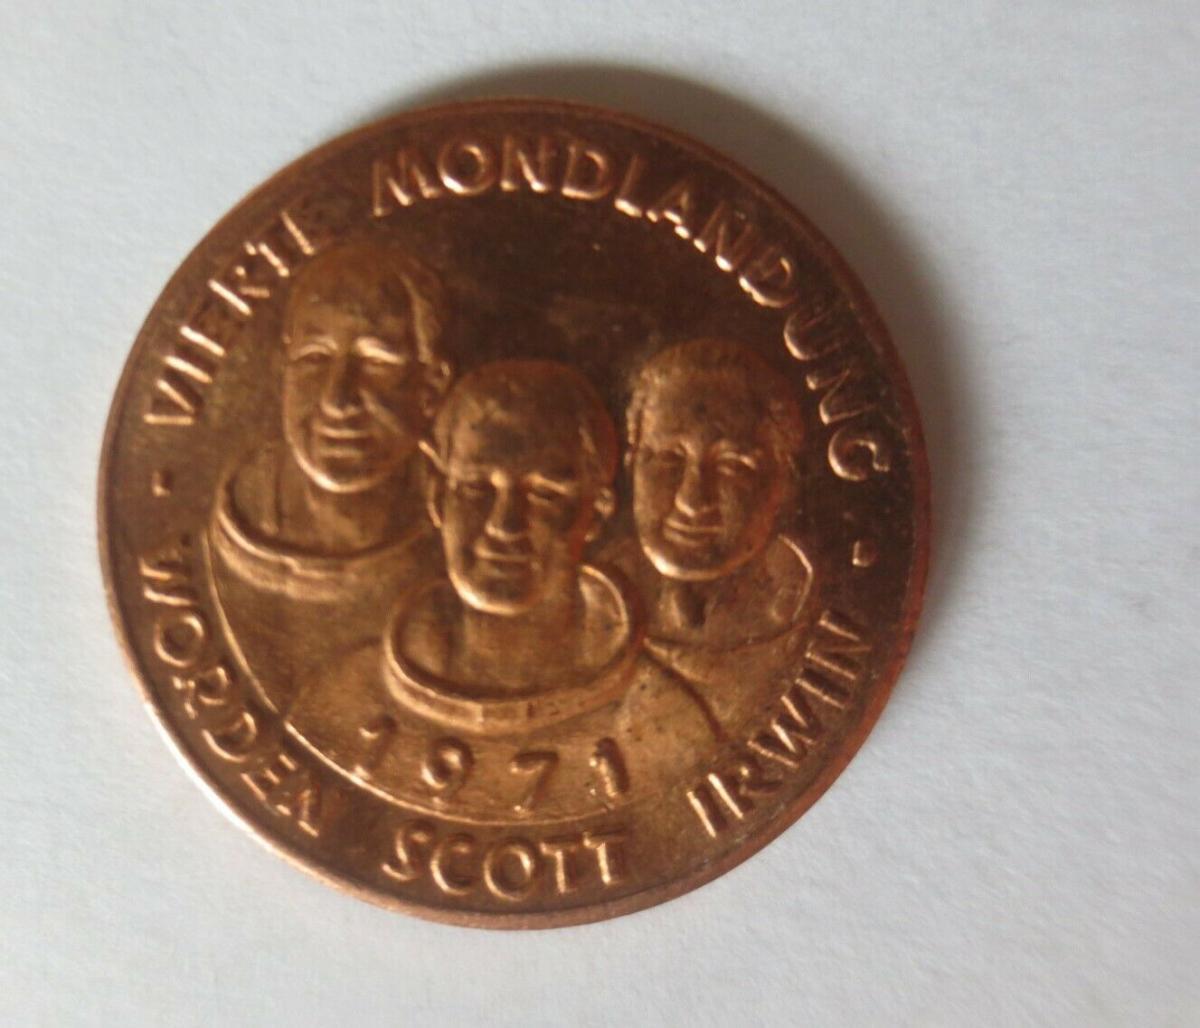 Medaille 1971 Deutschland Apollo 15 - Raumfahrt - Scott - Worden - Irwin♥(17803) 0